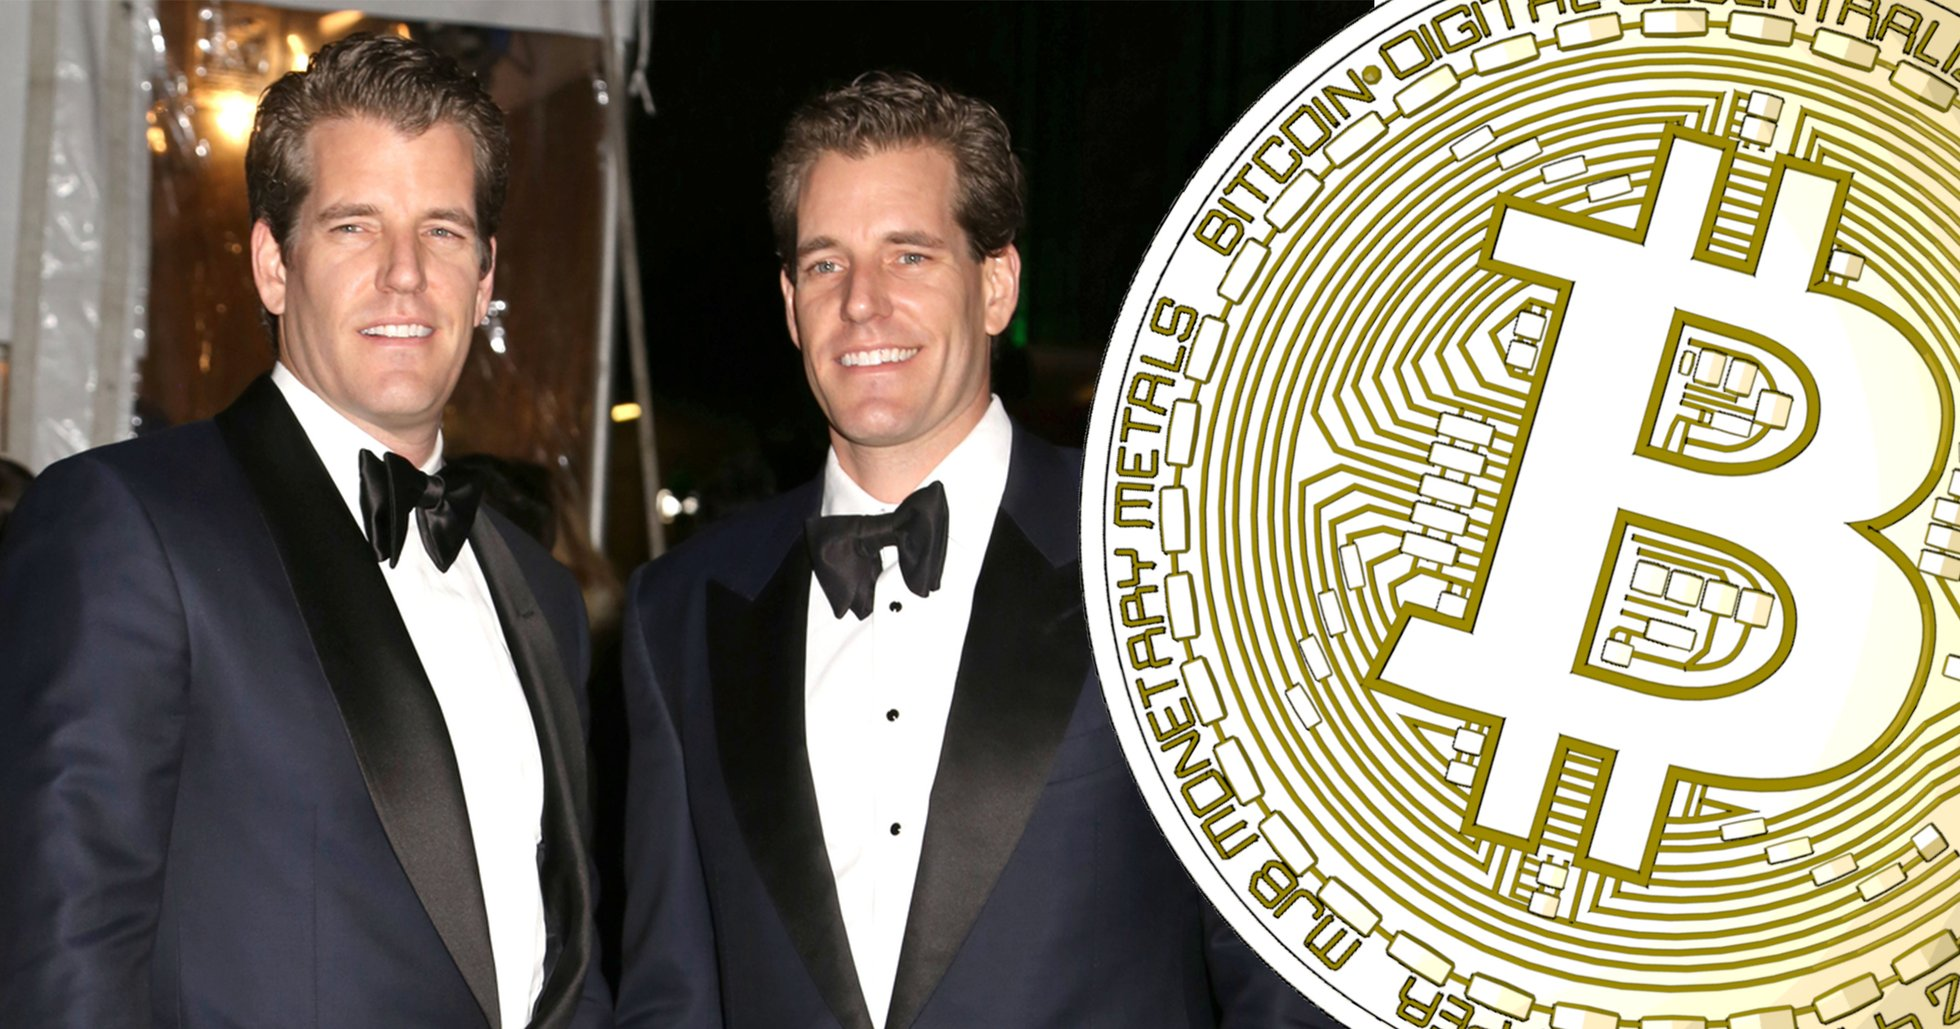 Bitcoin rally makes Cameron and Tyler Winklevoss billionaires